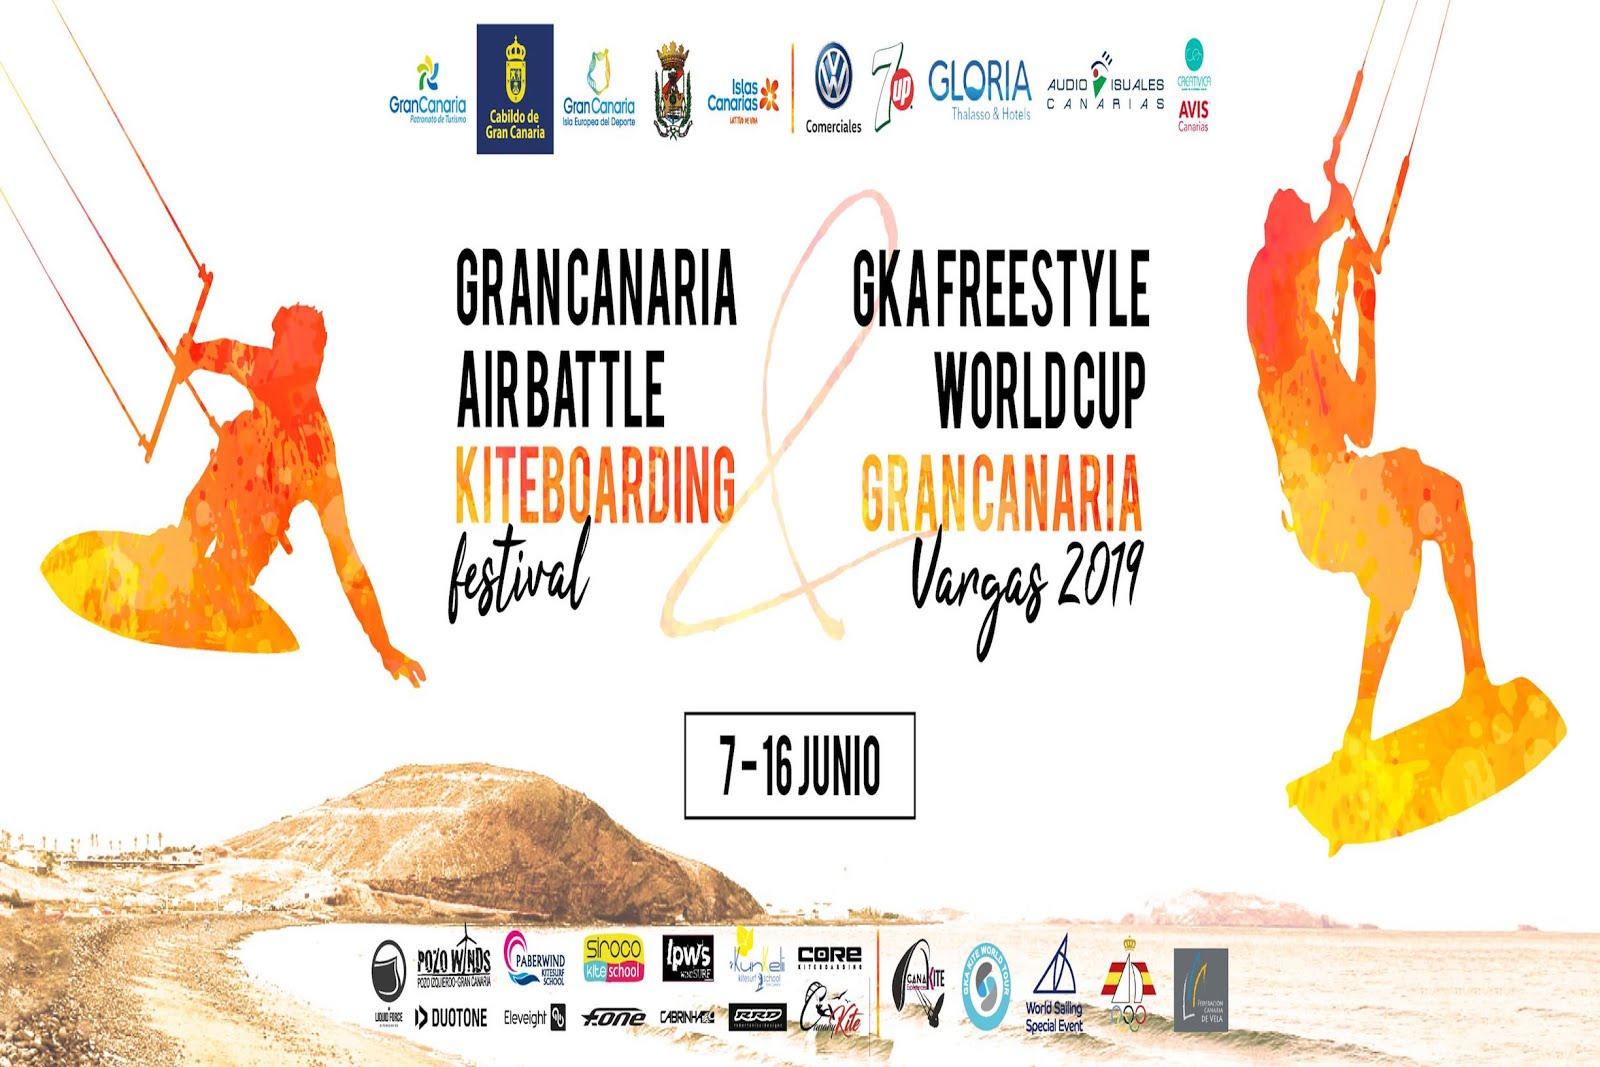 Gran Canaria Airbattle Kiteboarding Festival Vargas 2019